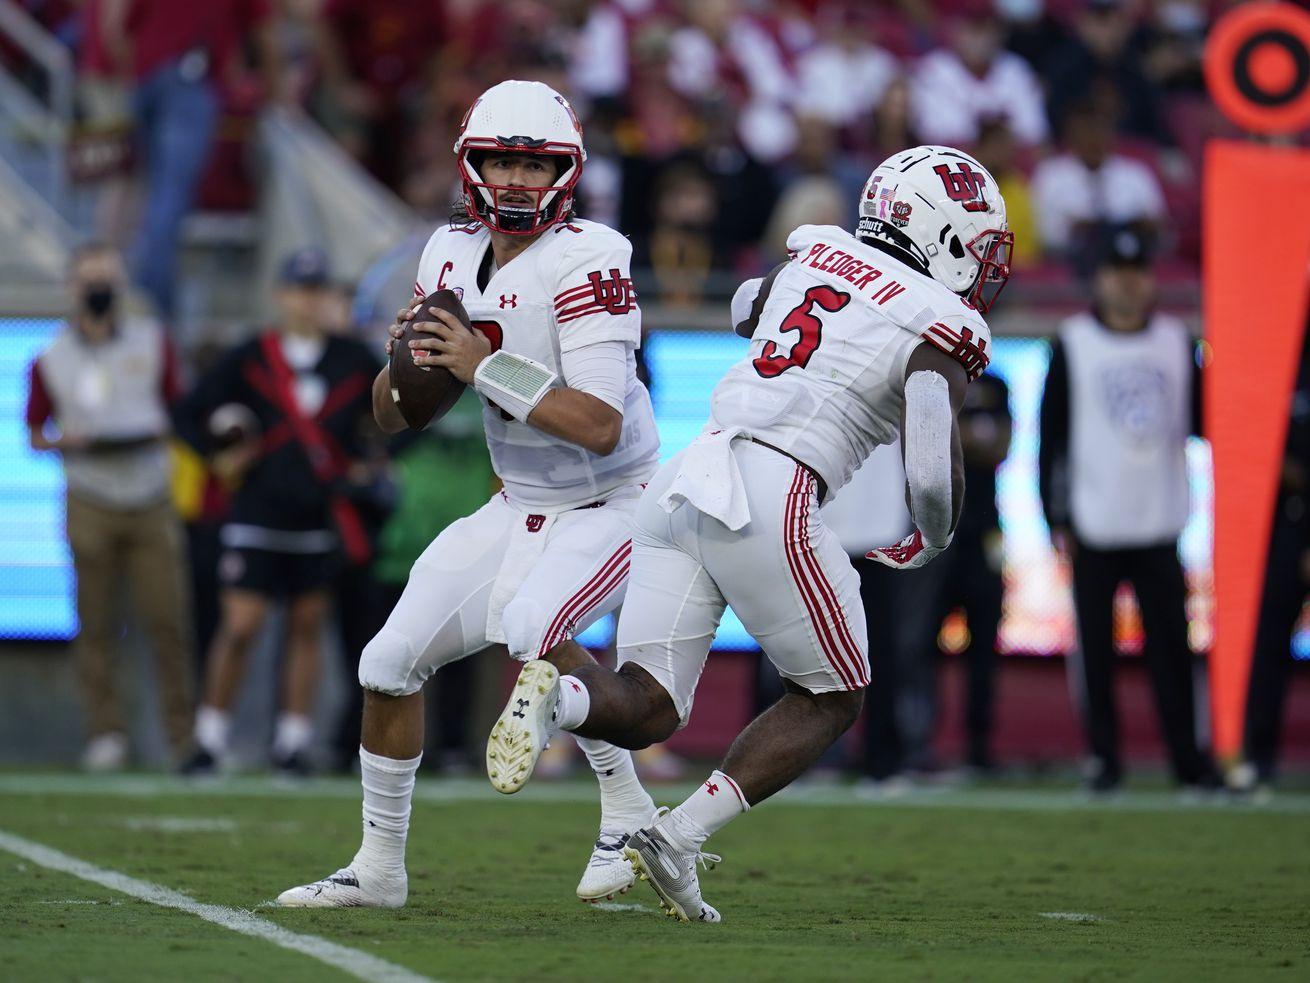 Utah quarterback Cameron Rising throws during game against Southern California Saturday, Oct. 9, 2021, in Los Angeles.